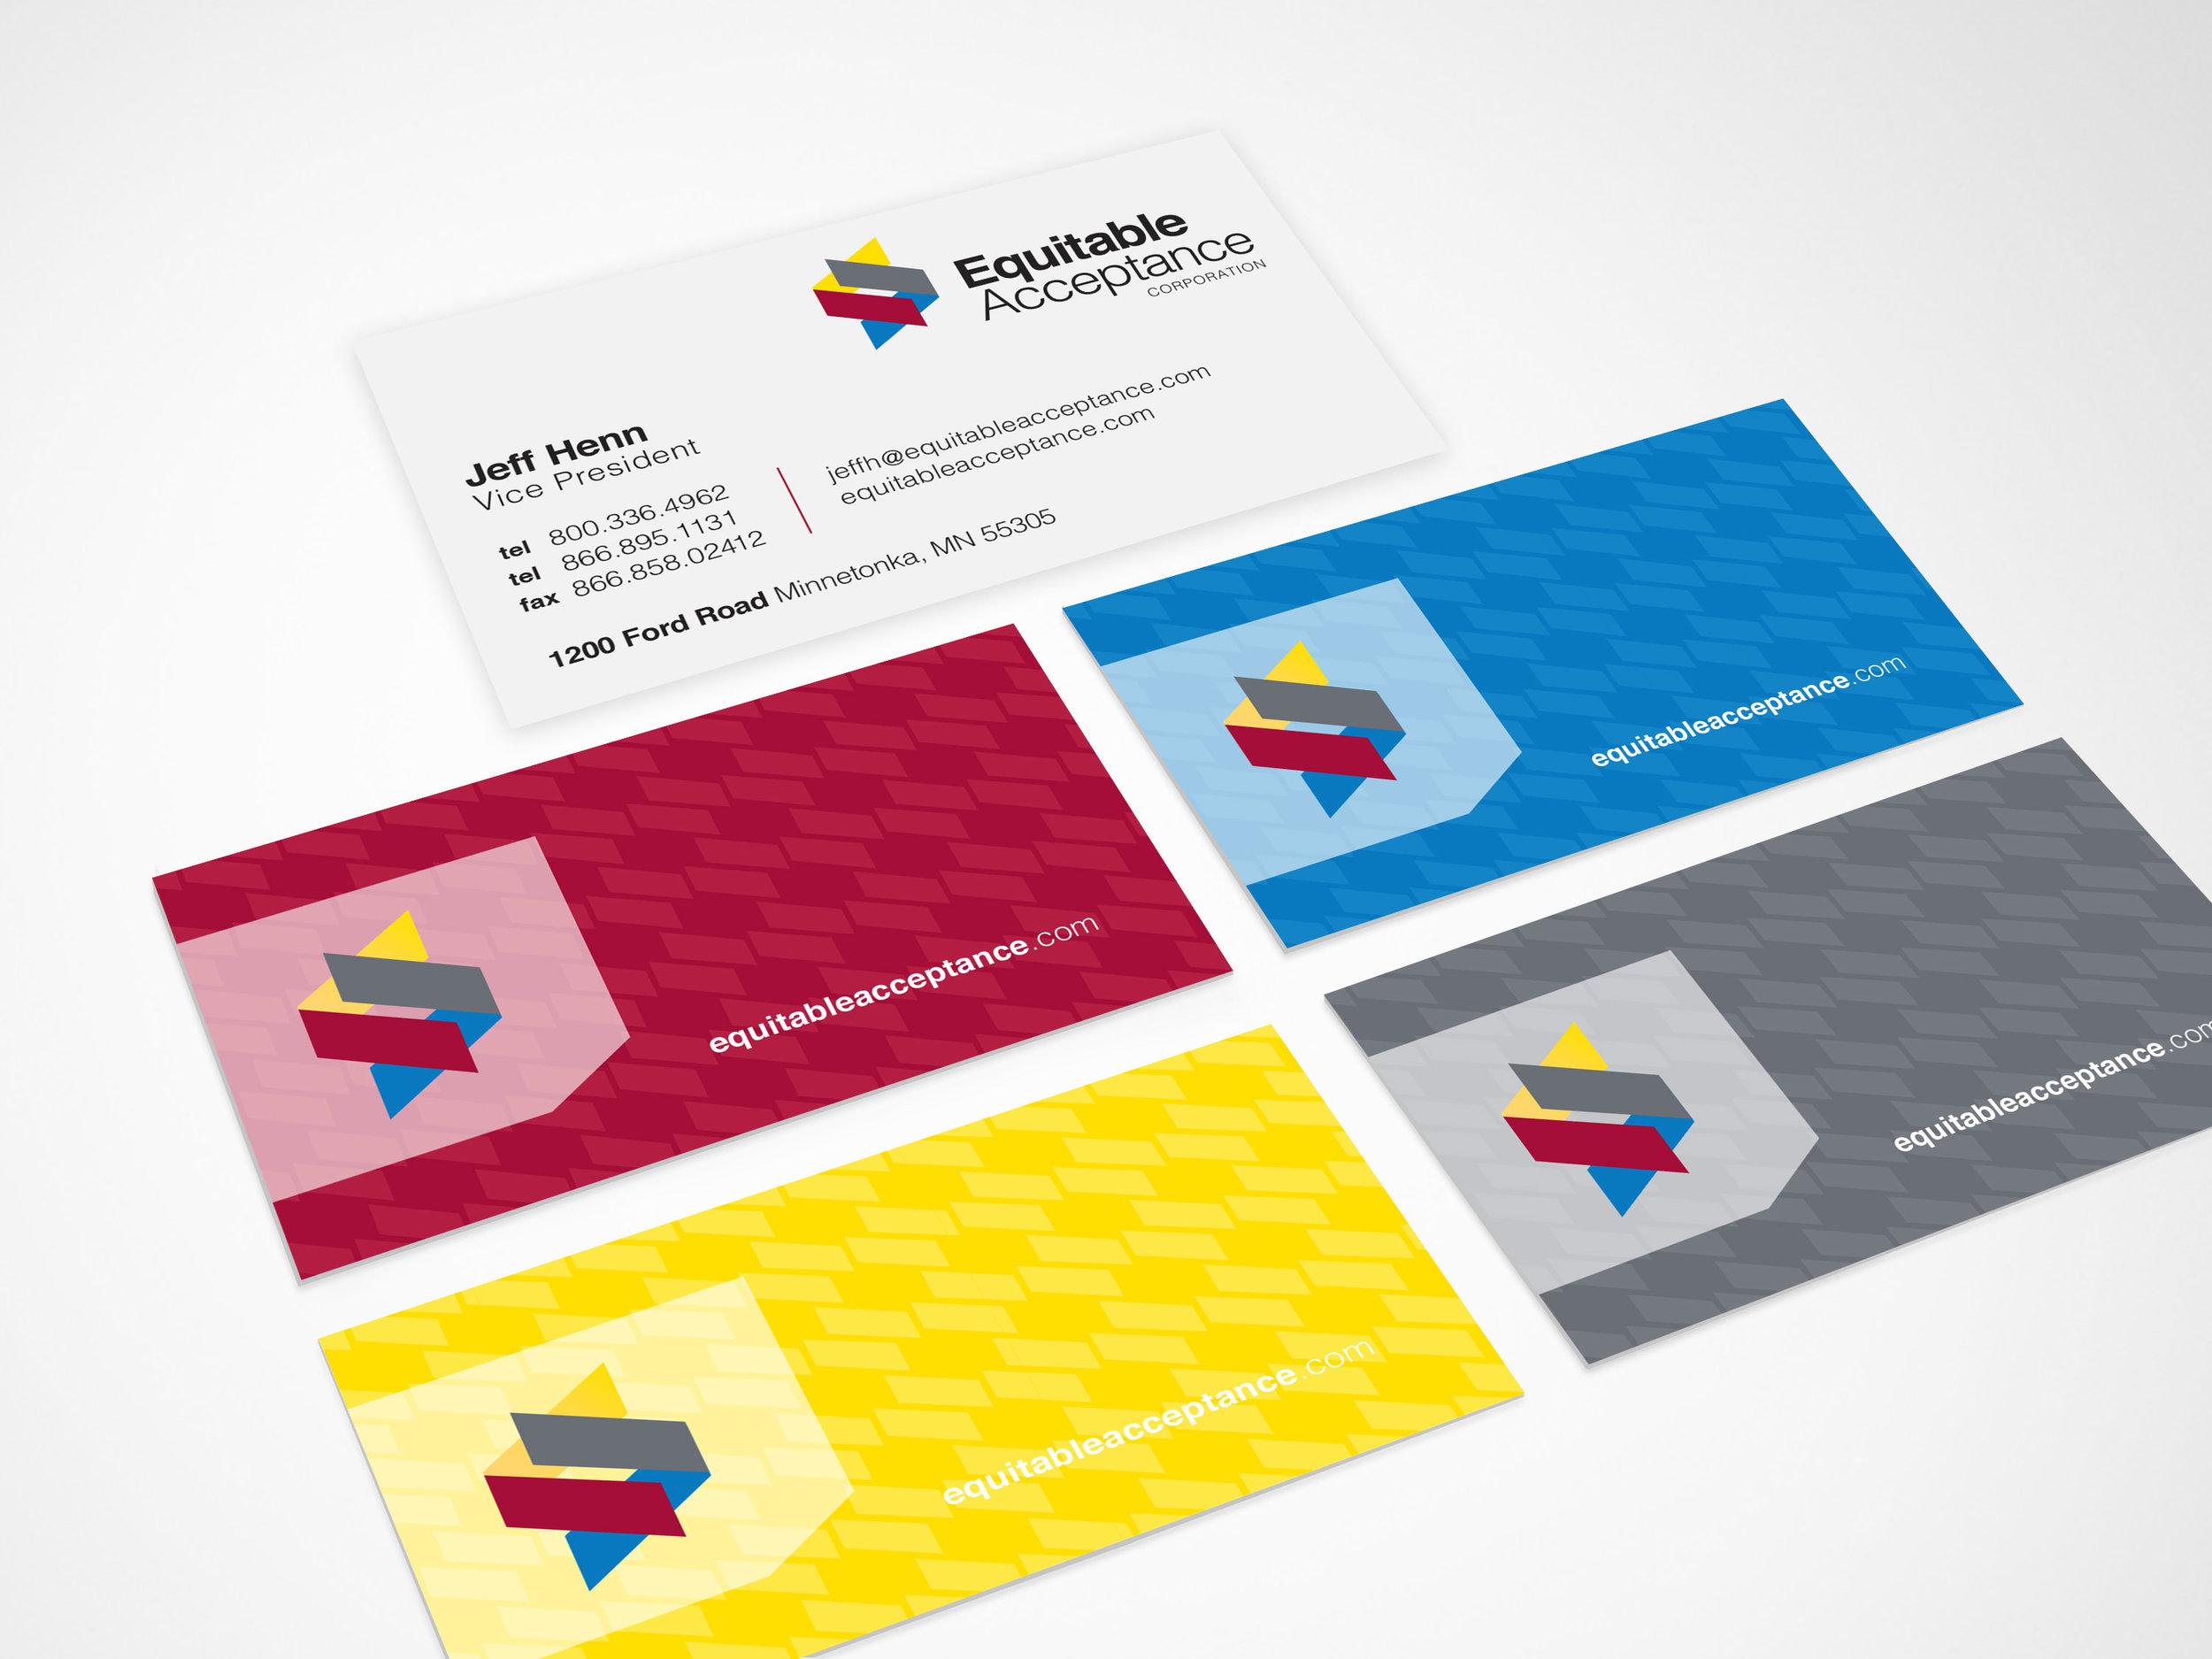 creativemccoy-design-equitableacceptance-branding-3.jpg